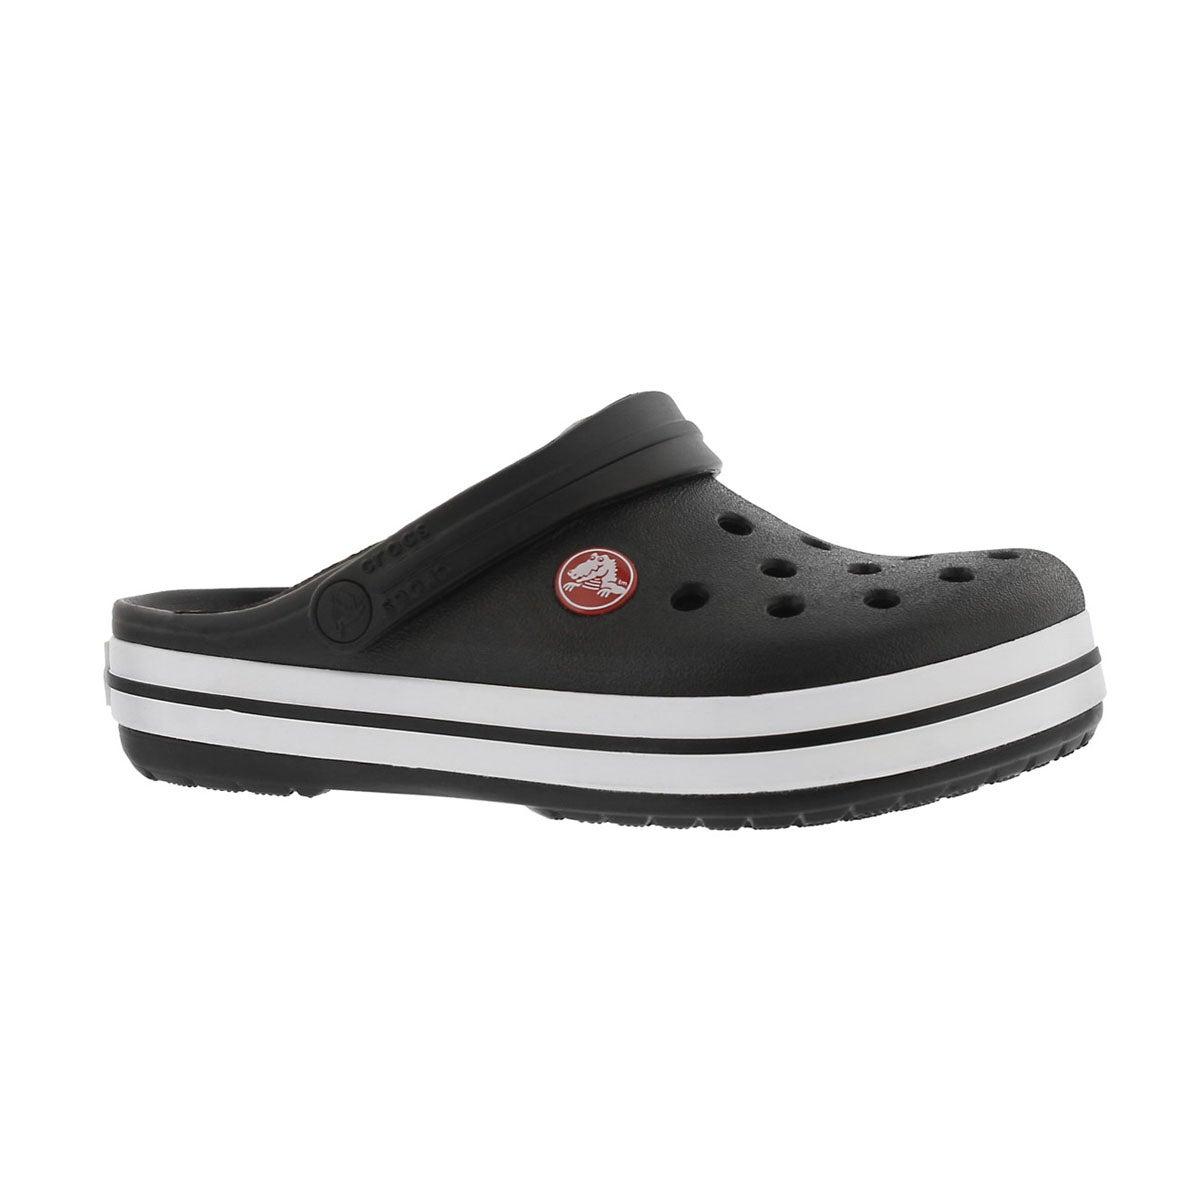 Kids' CROCBAND black EVA comfort clogs